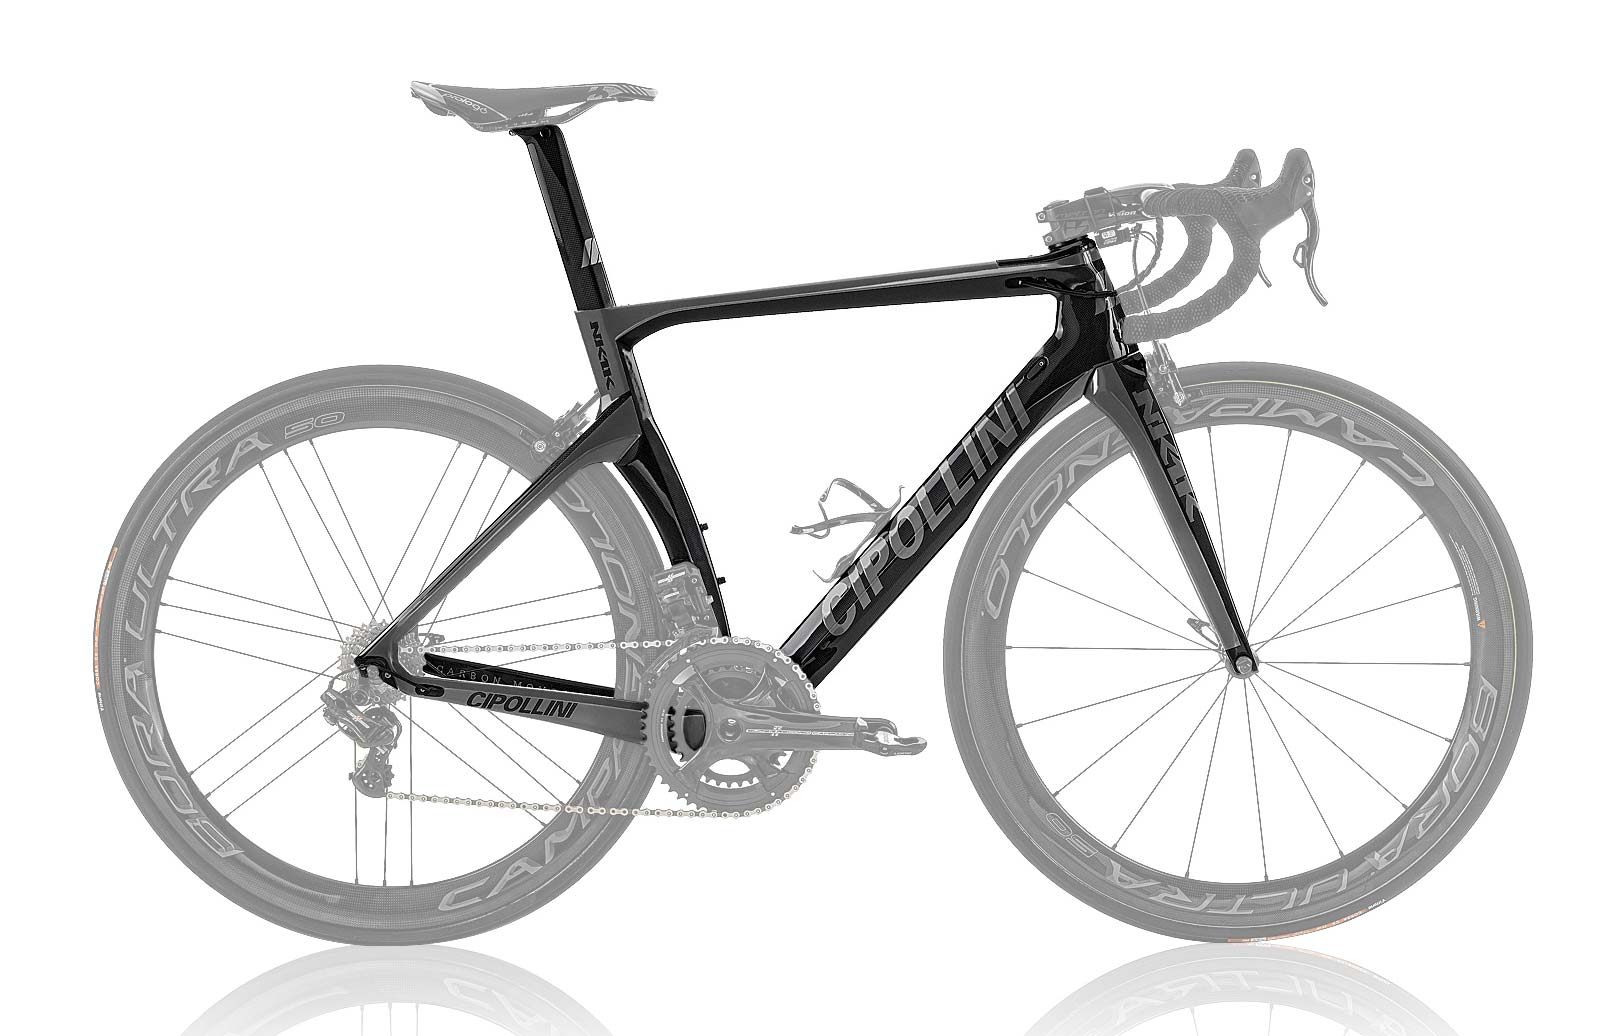 Fastest Road Bike >> Cipollini NK1K Disc Frameset | R&A Cycles